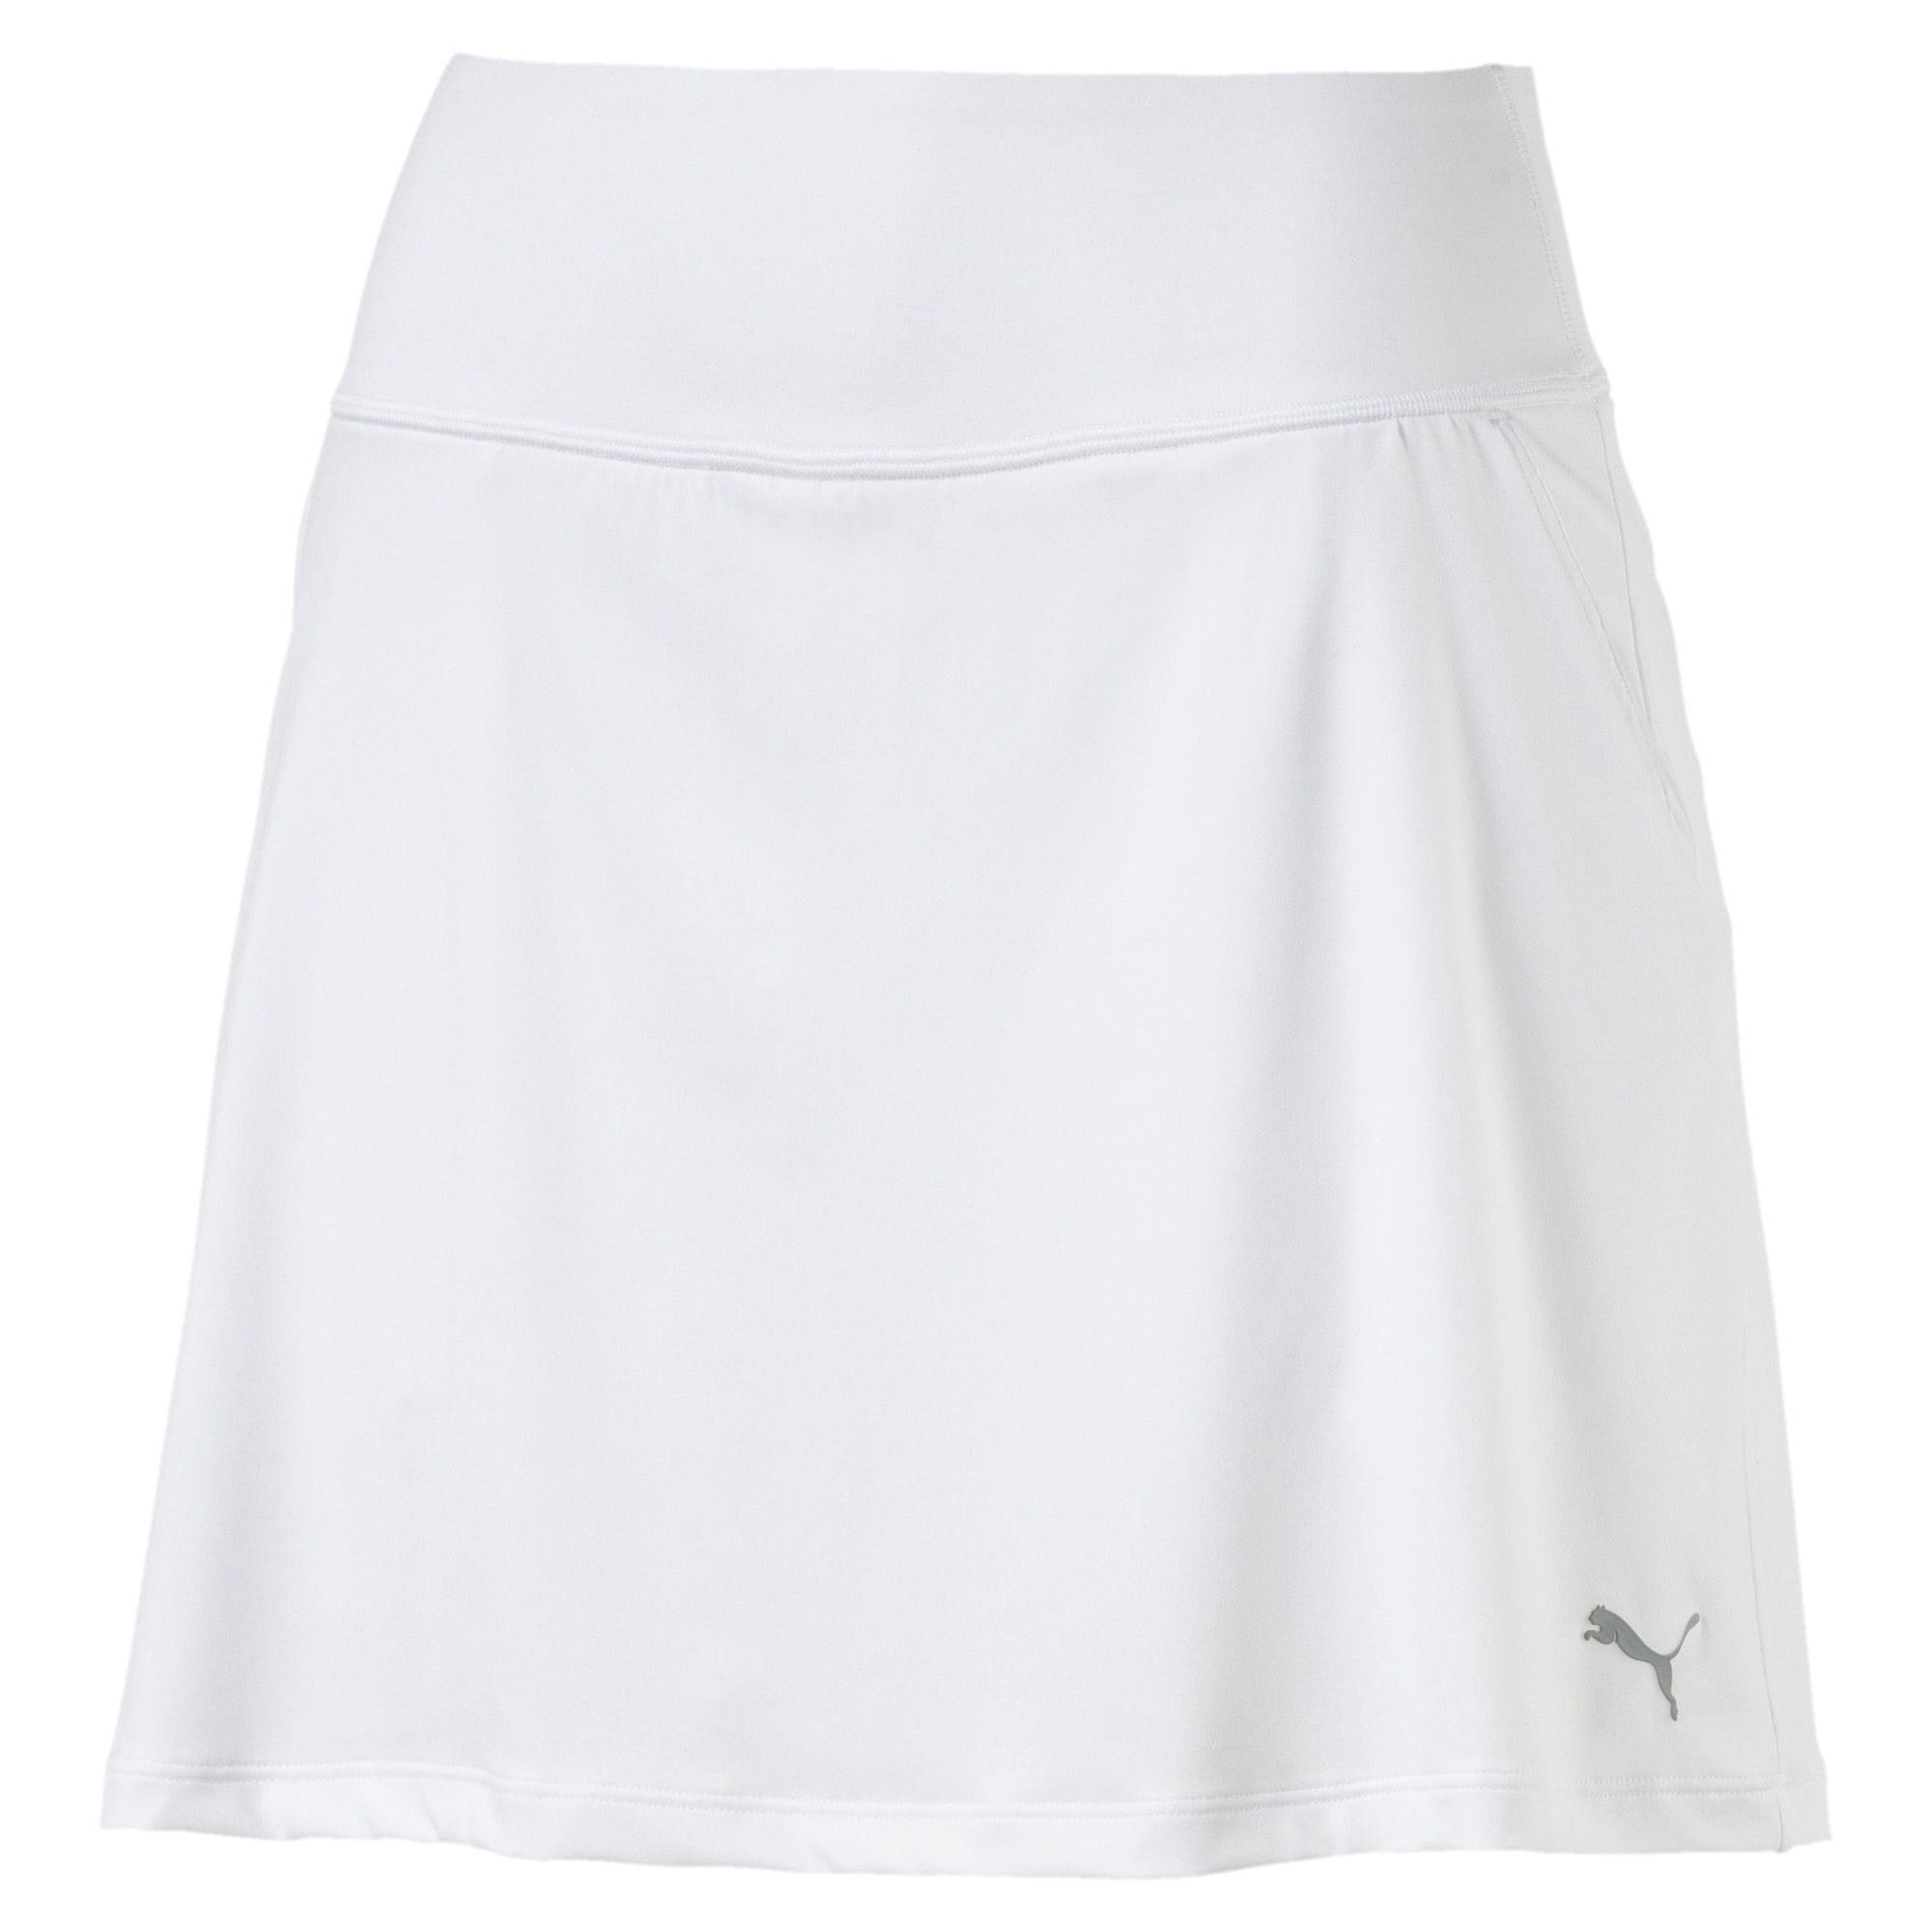 Thumbnail 1 of Golf Women's PWRSHAPE Solid Knit Skirt, Bright White, medium